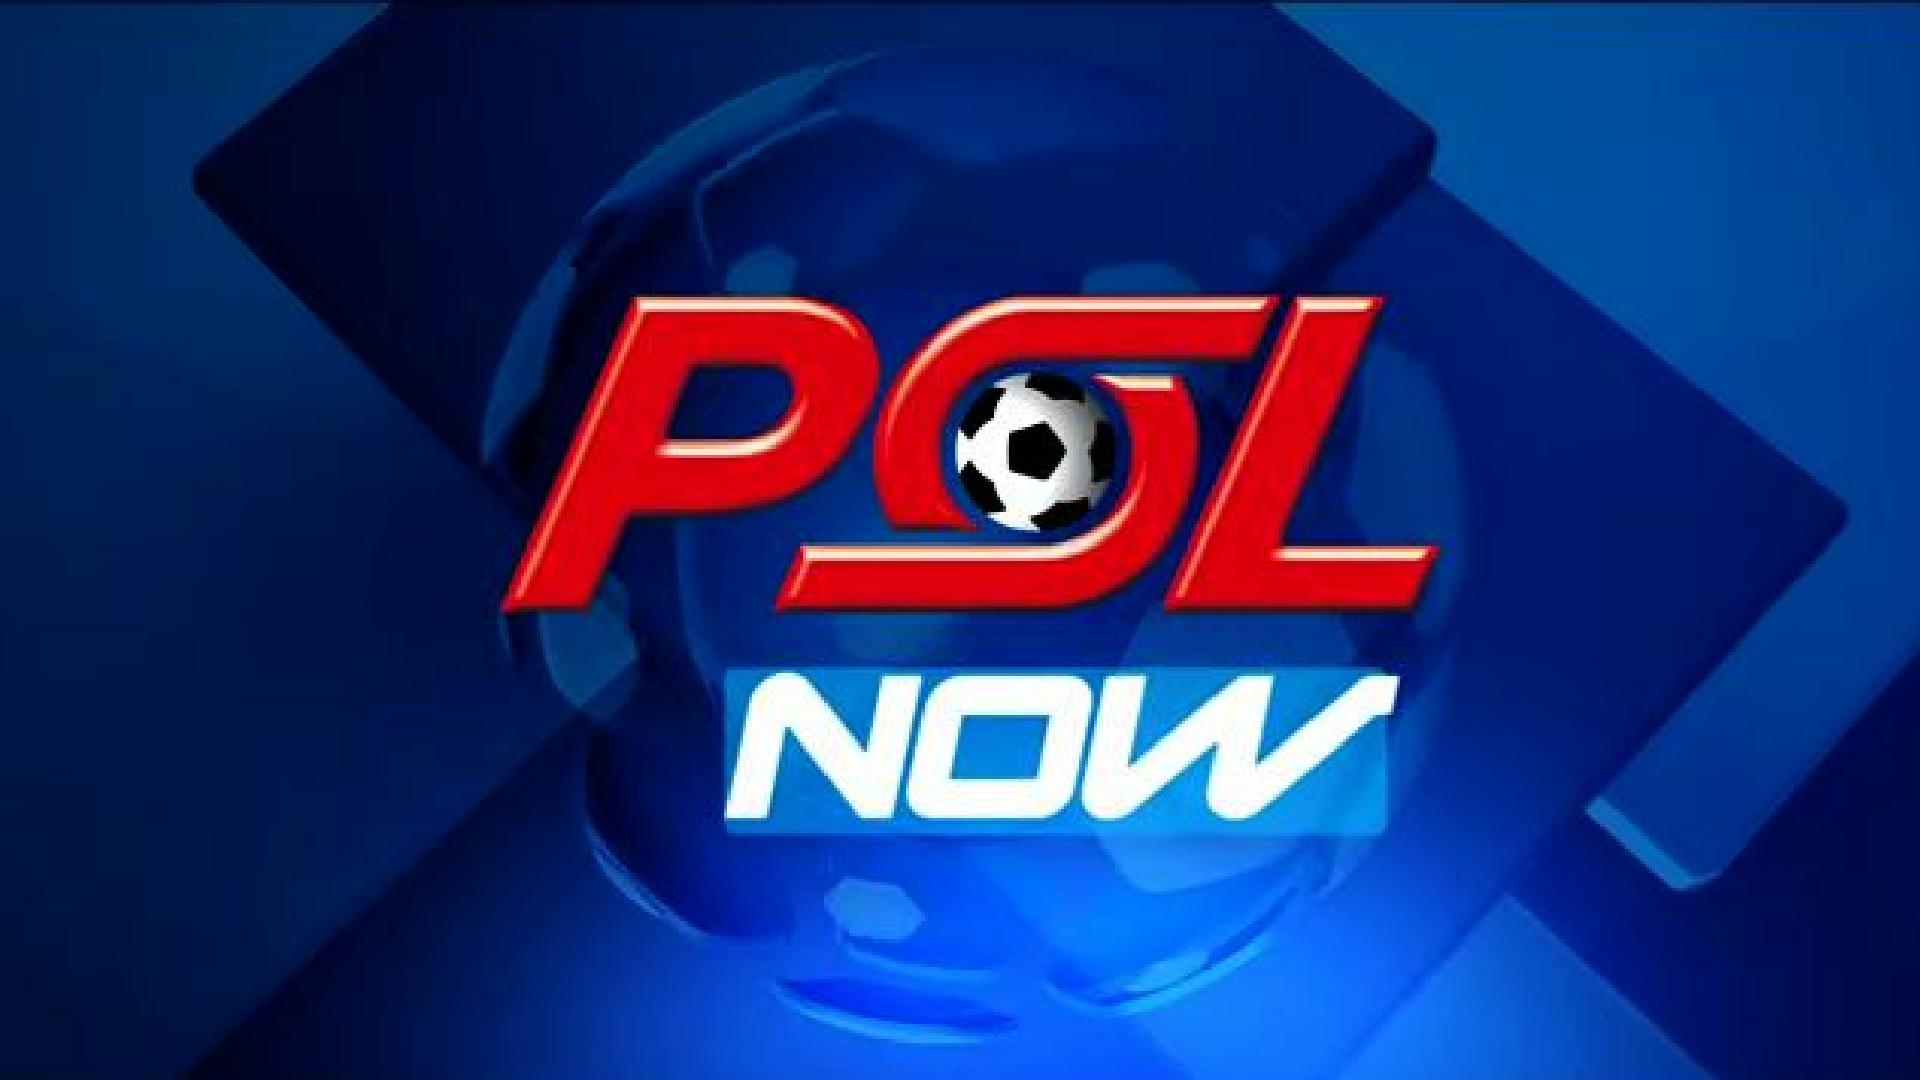 DStv Premiership | PSL Now | Episode 3